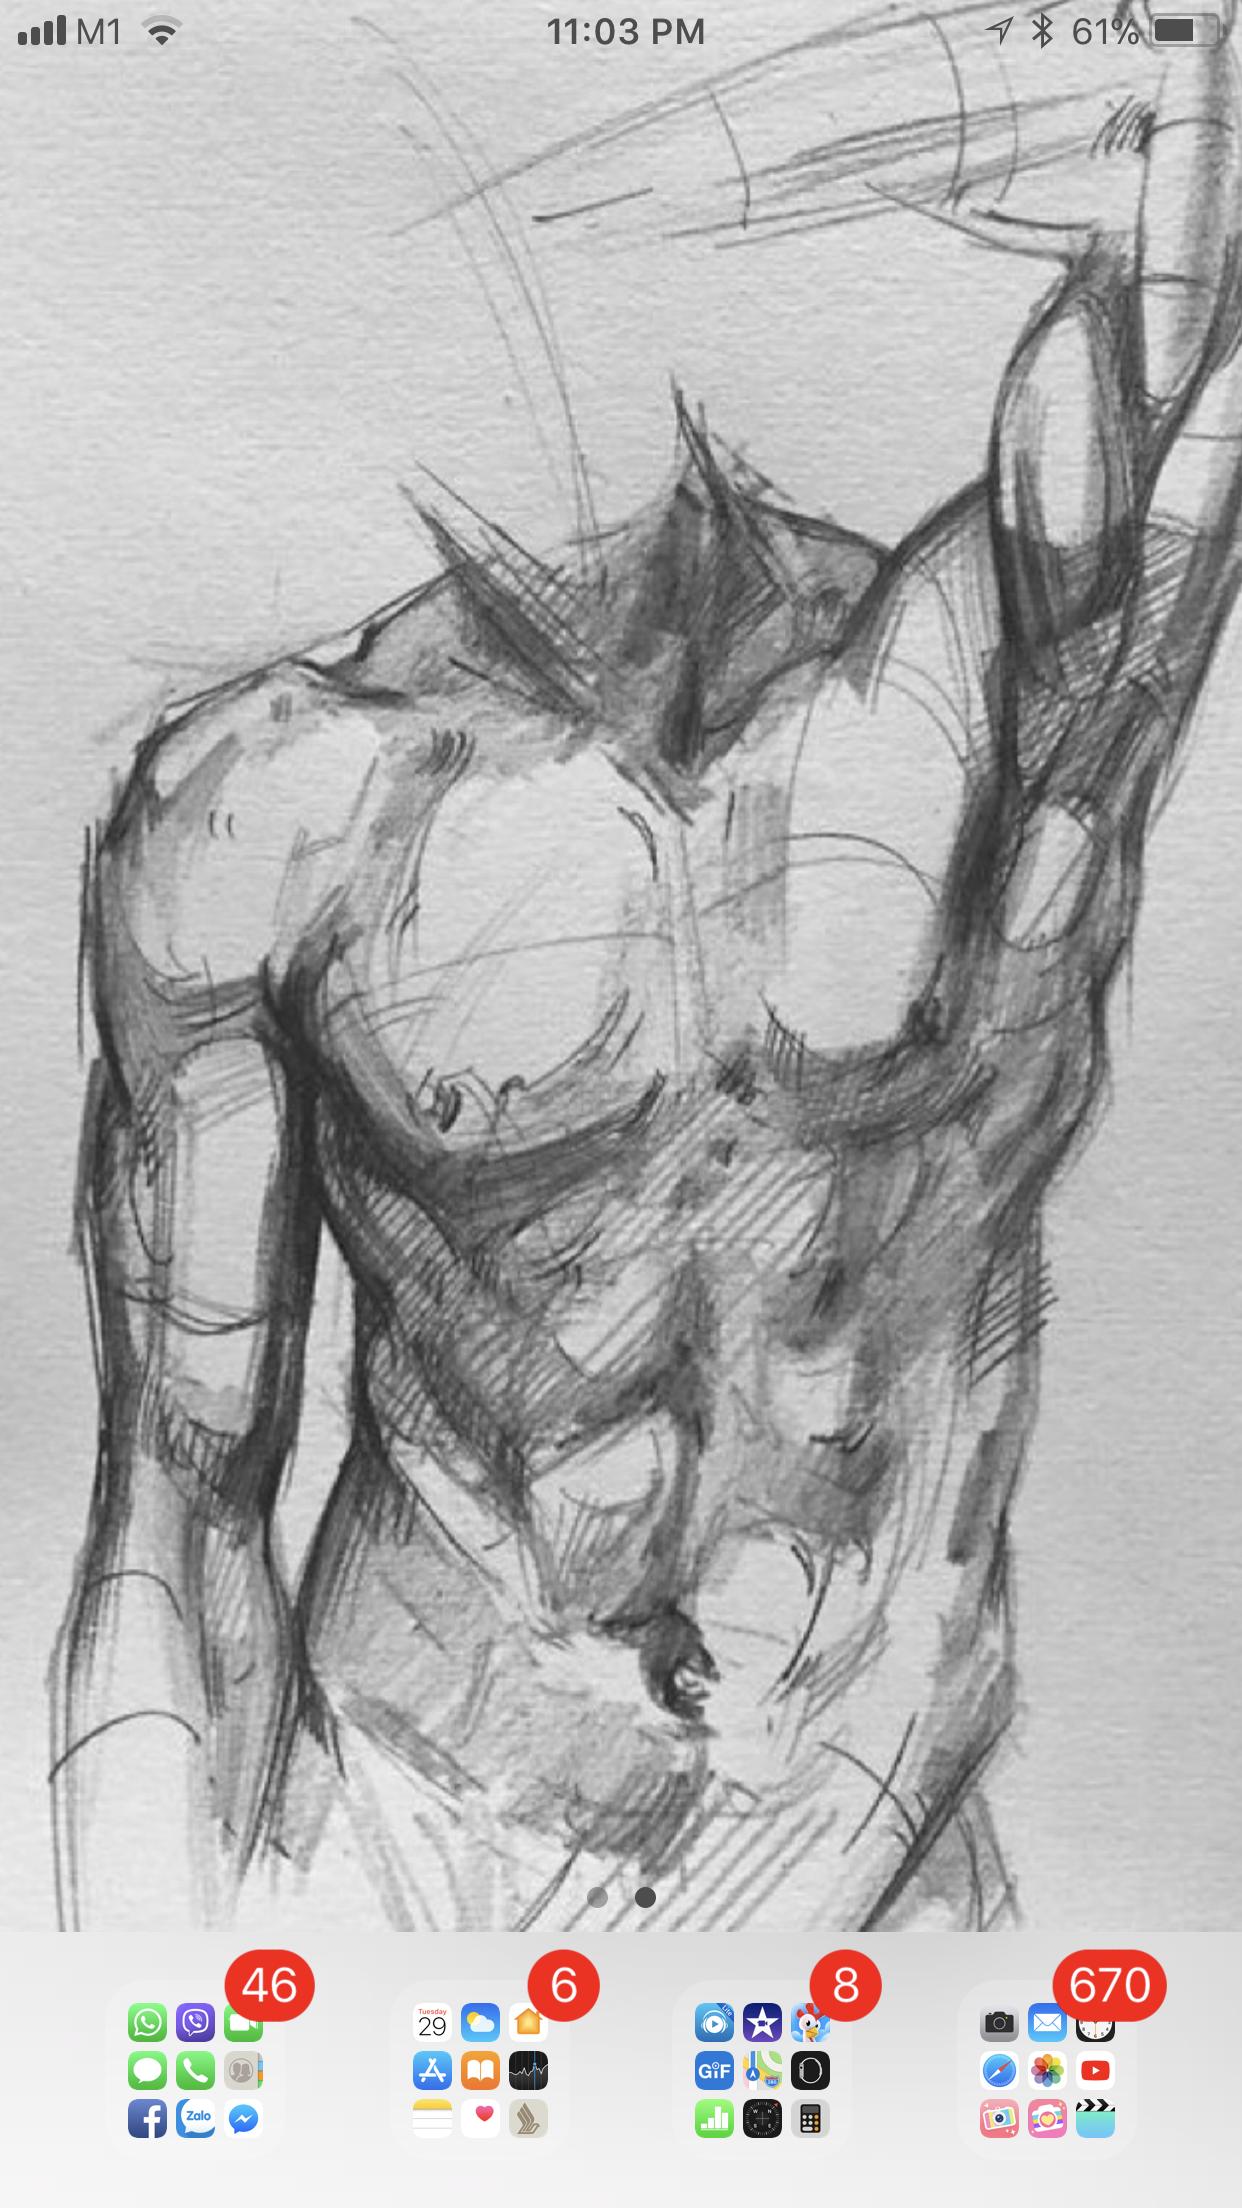 Pin By Karen Ngọc Nguyễn On Ktr Anatomy Art Anatomy Sketches Art Sketches